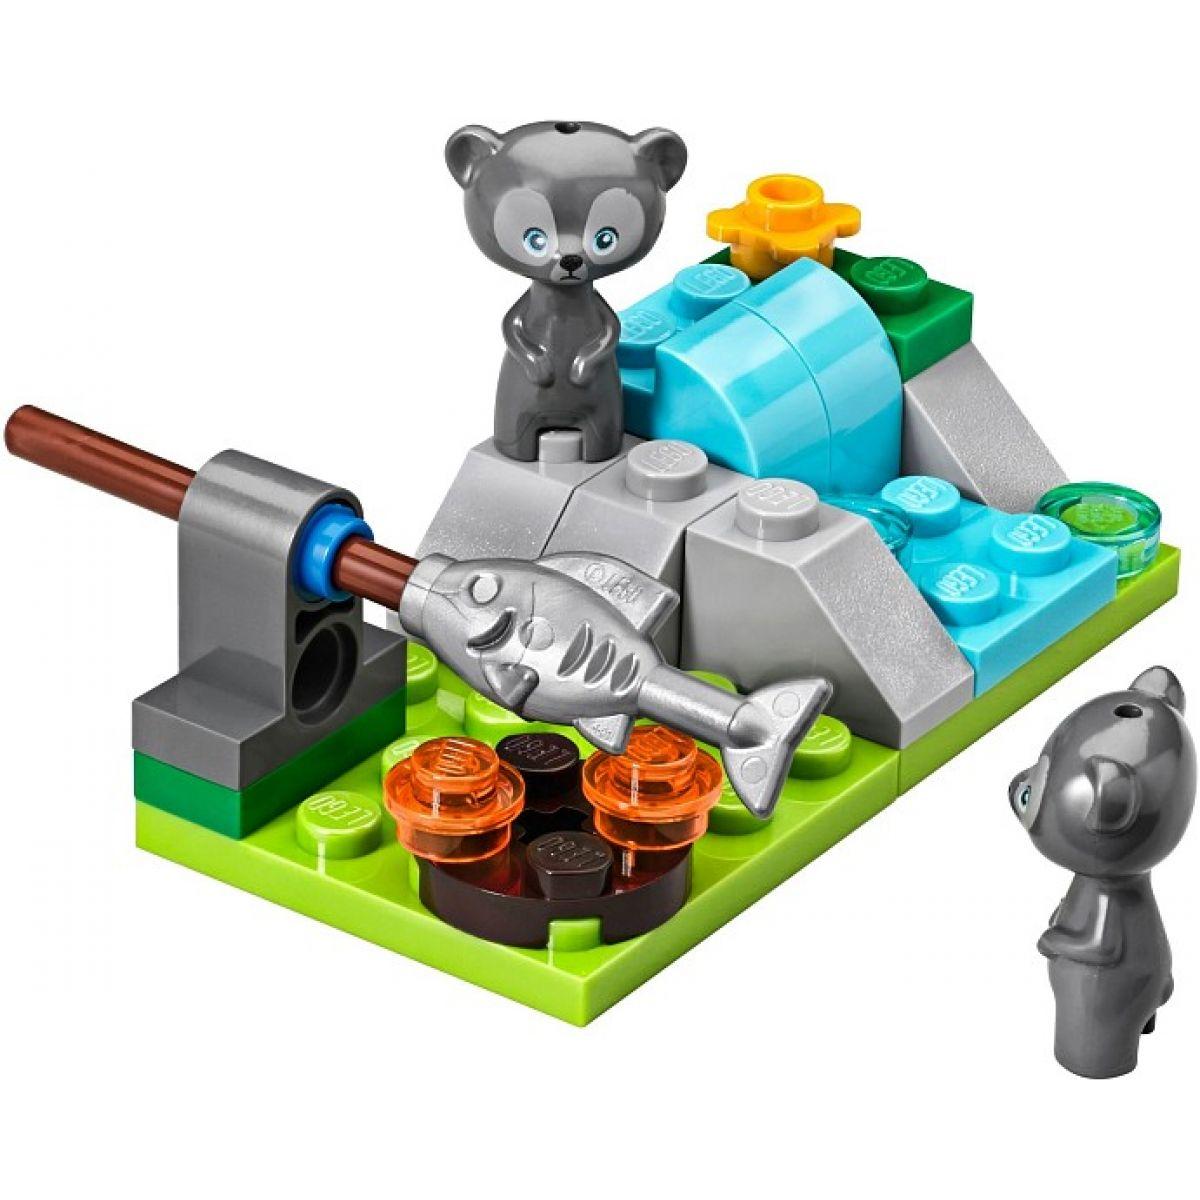 LEGO Disney Princess 41051 Hry princezny Meridy #4